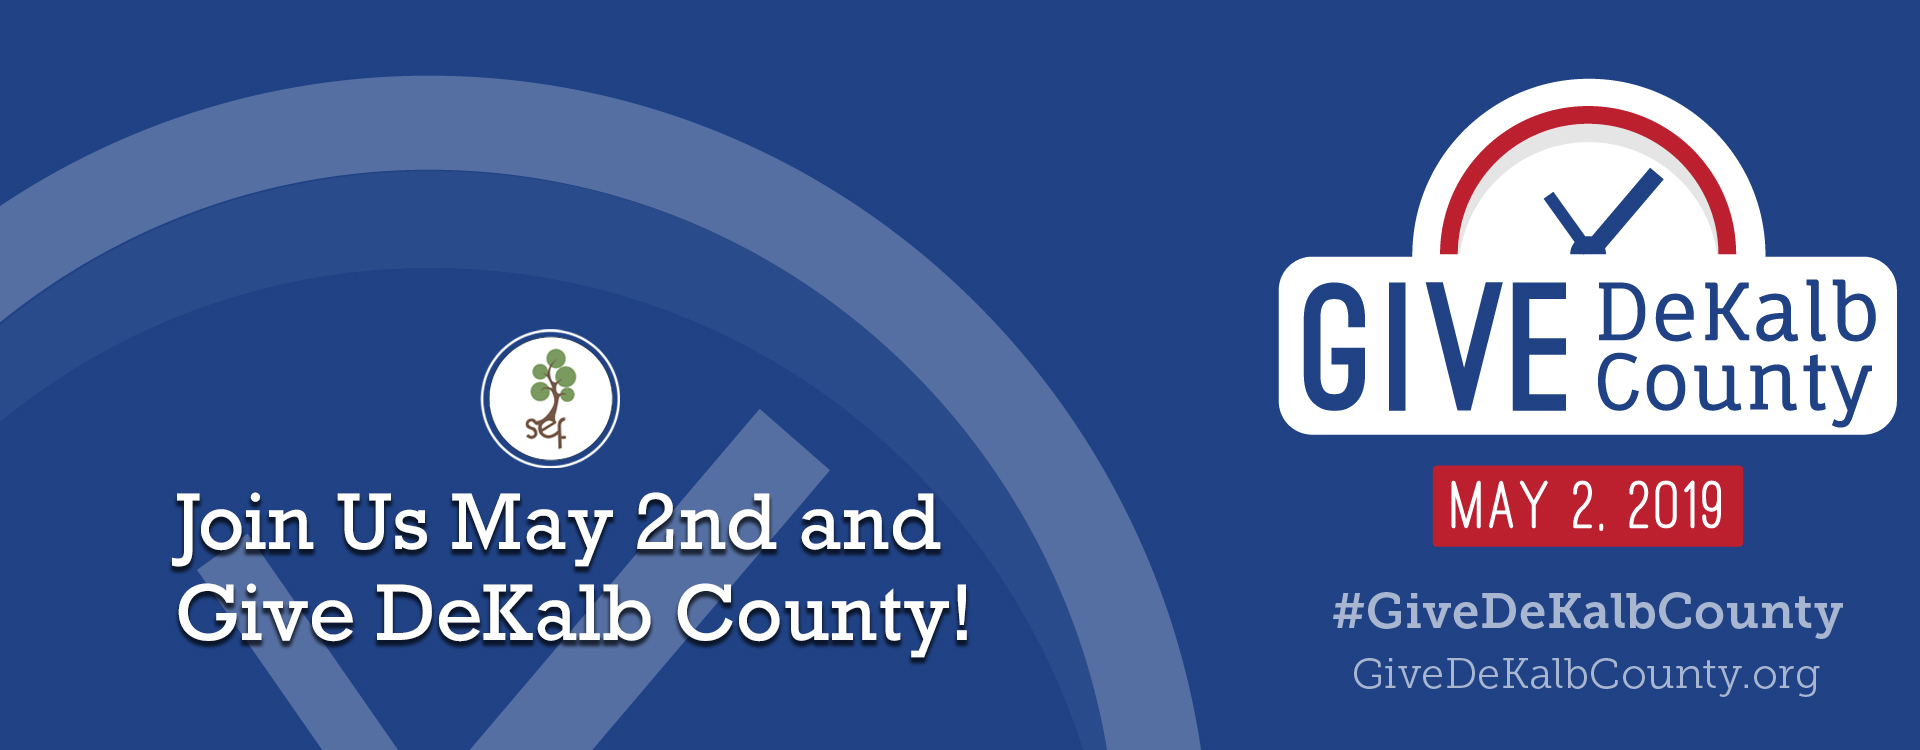 Give DeKalb County 2019 - SEF